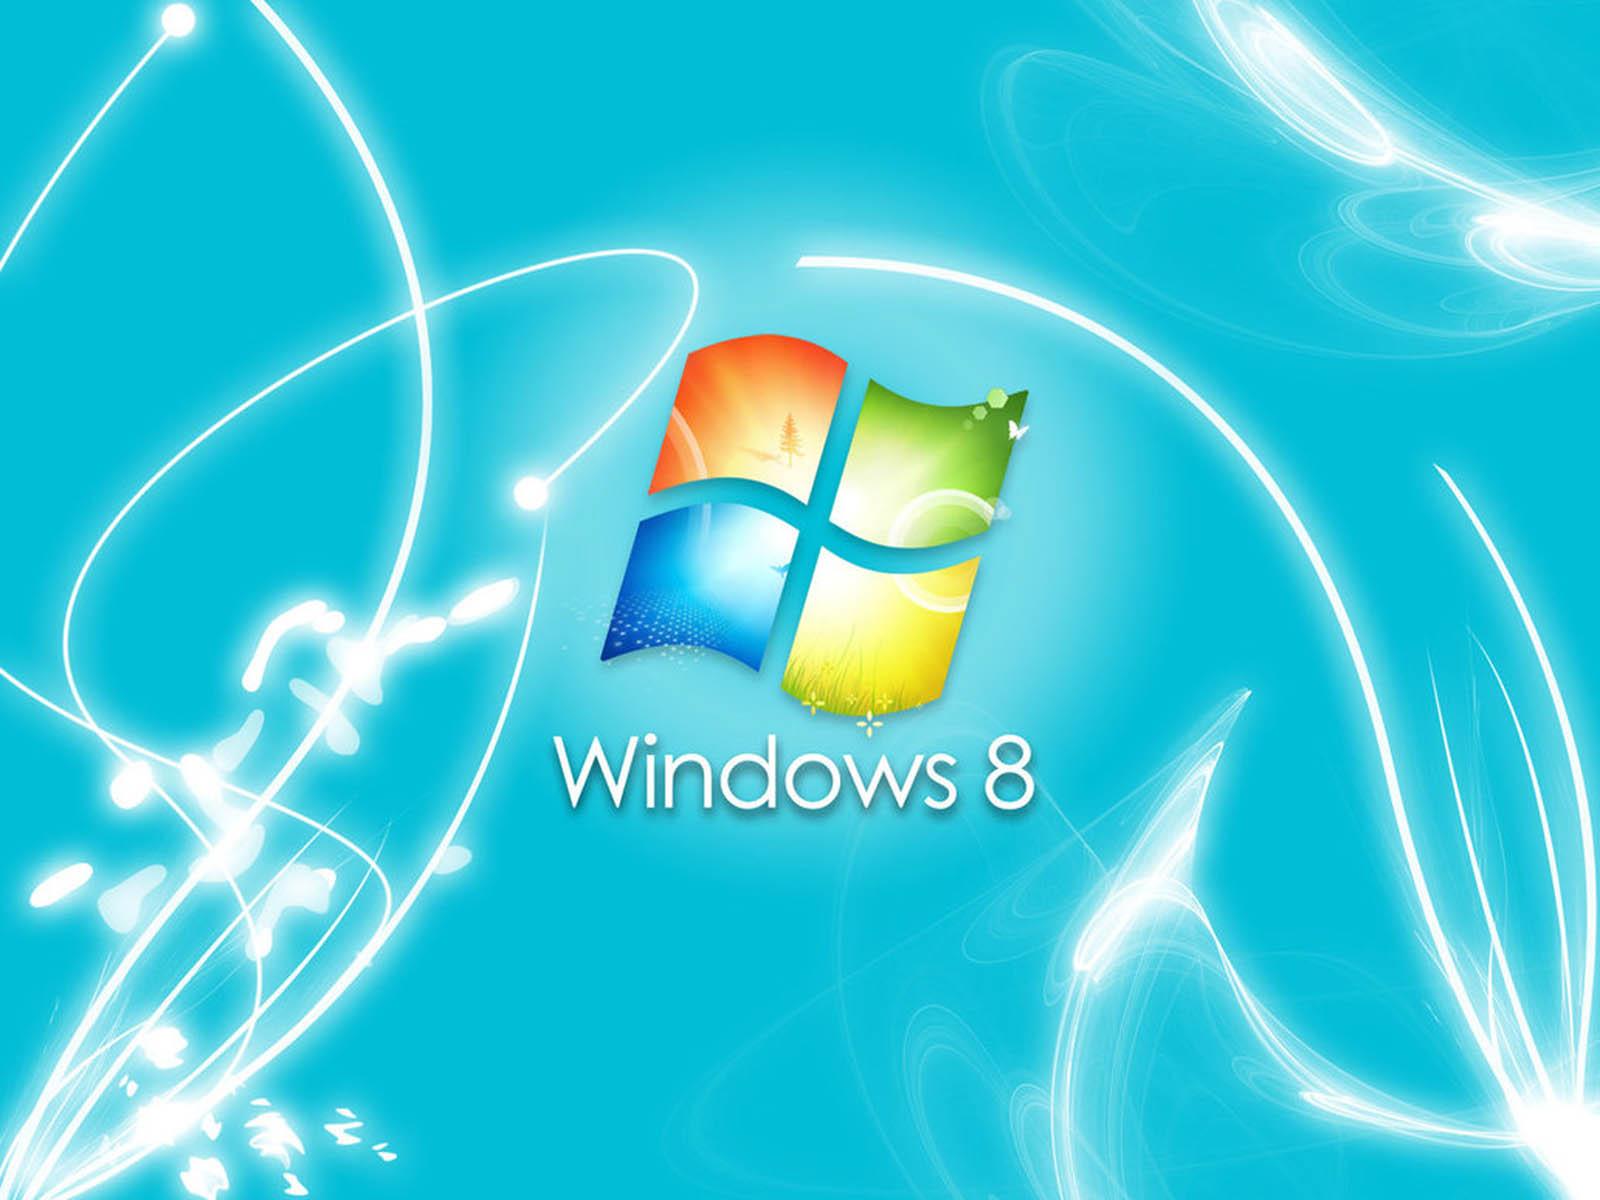 wallpapers Windows 8 Desktop Wallpapers and Backgrounds 1600x1200